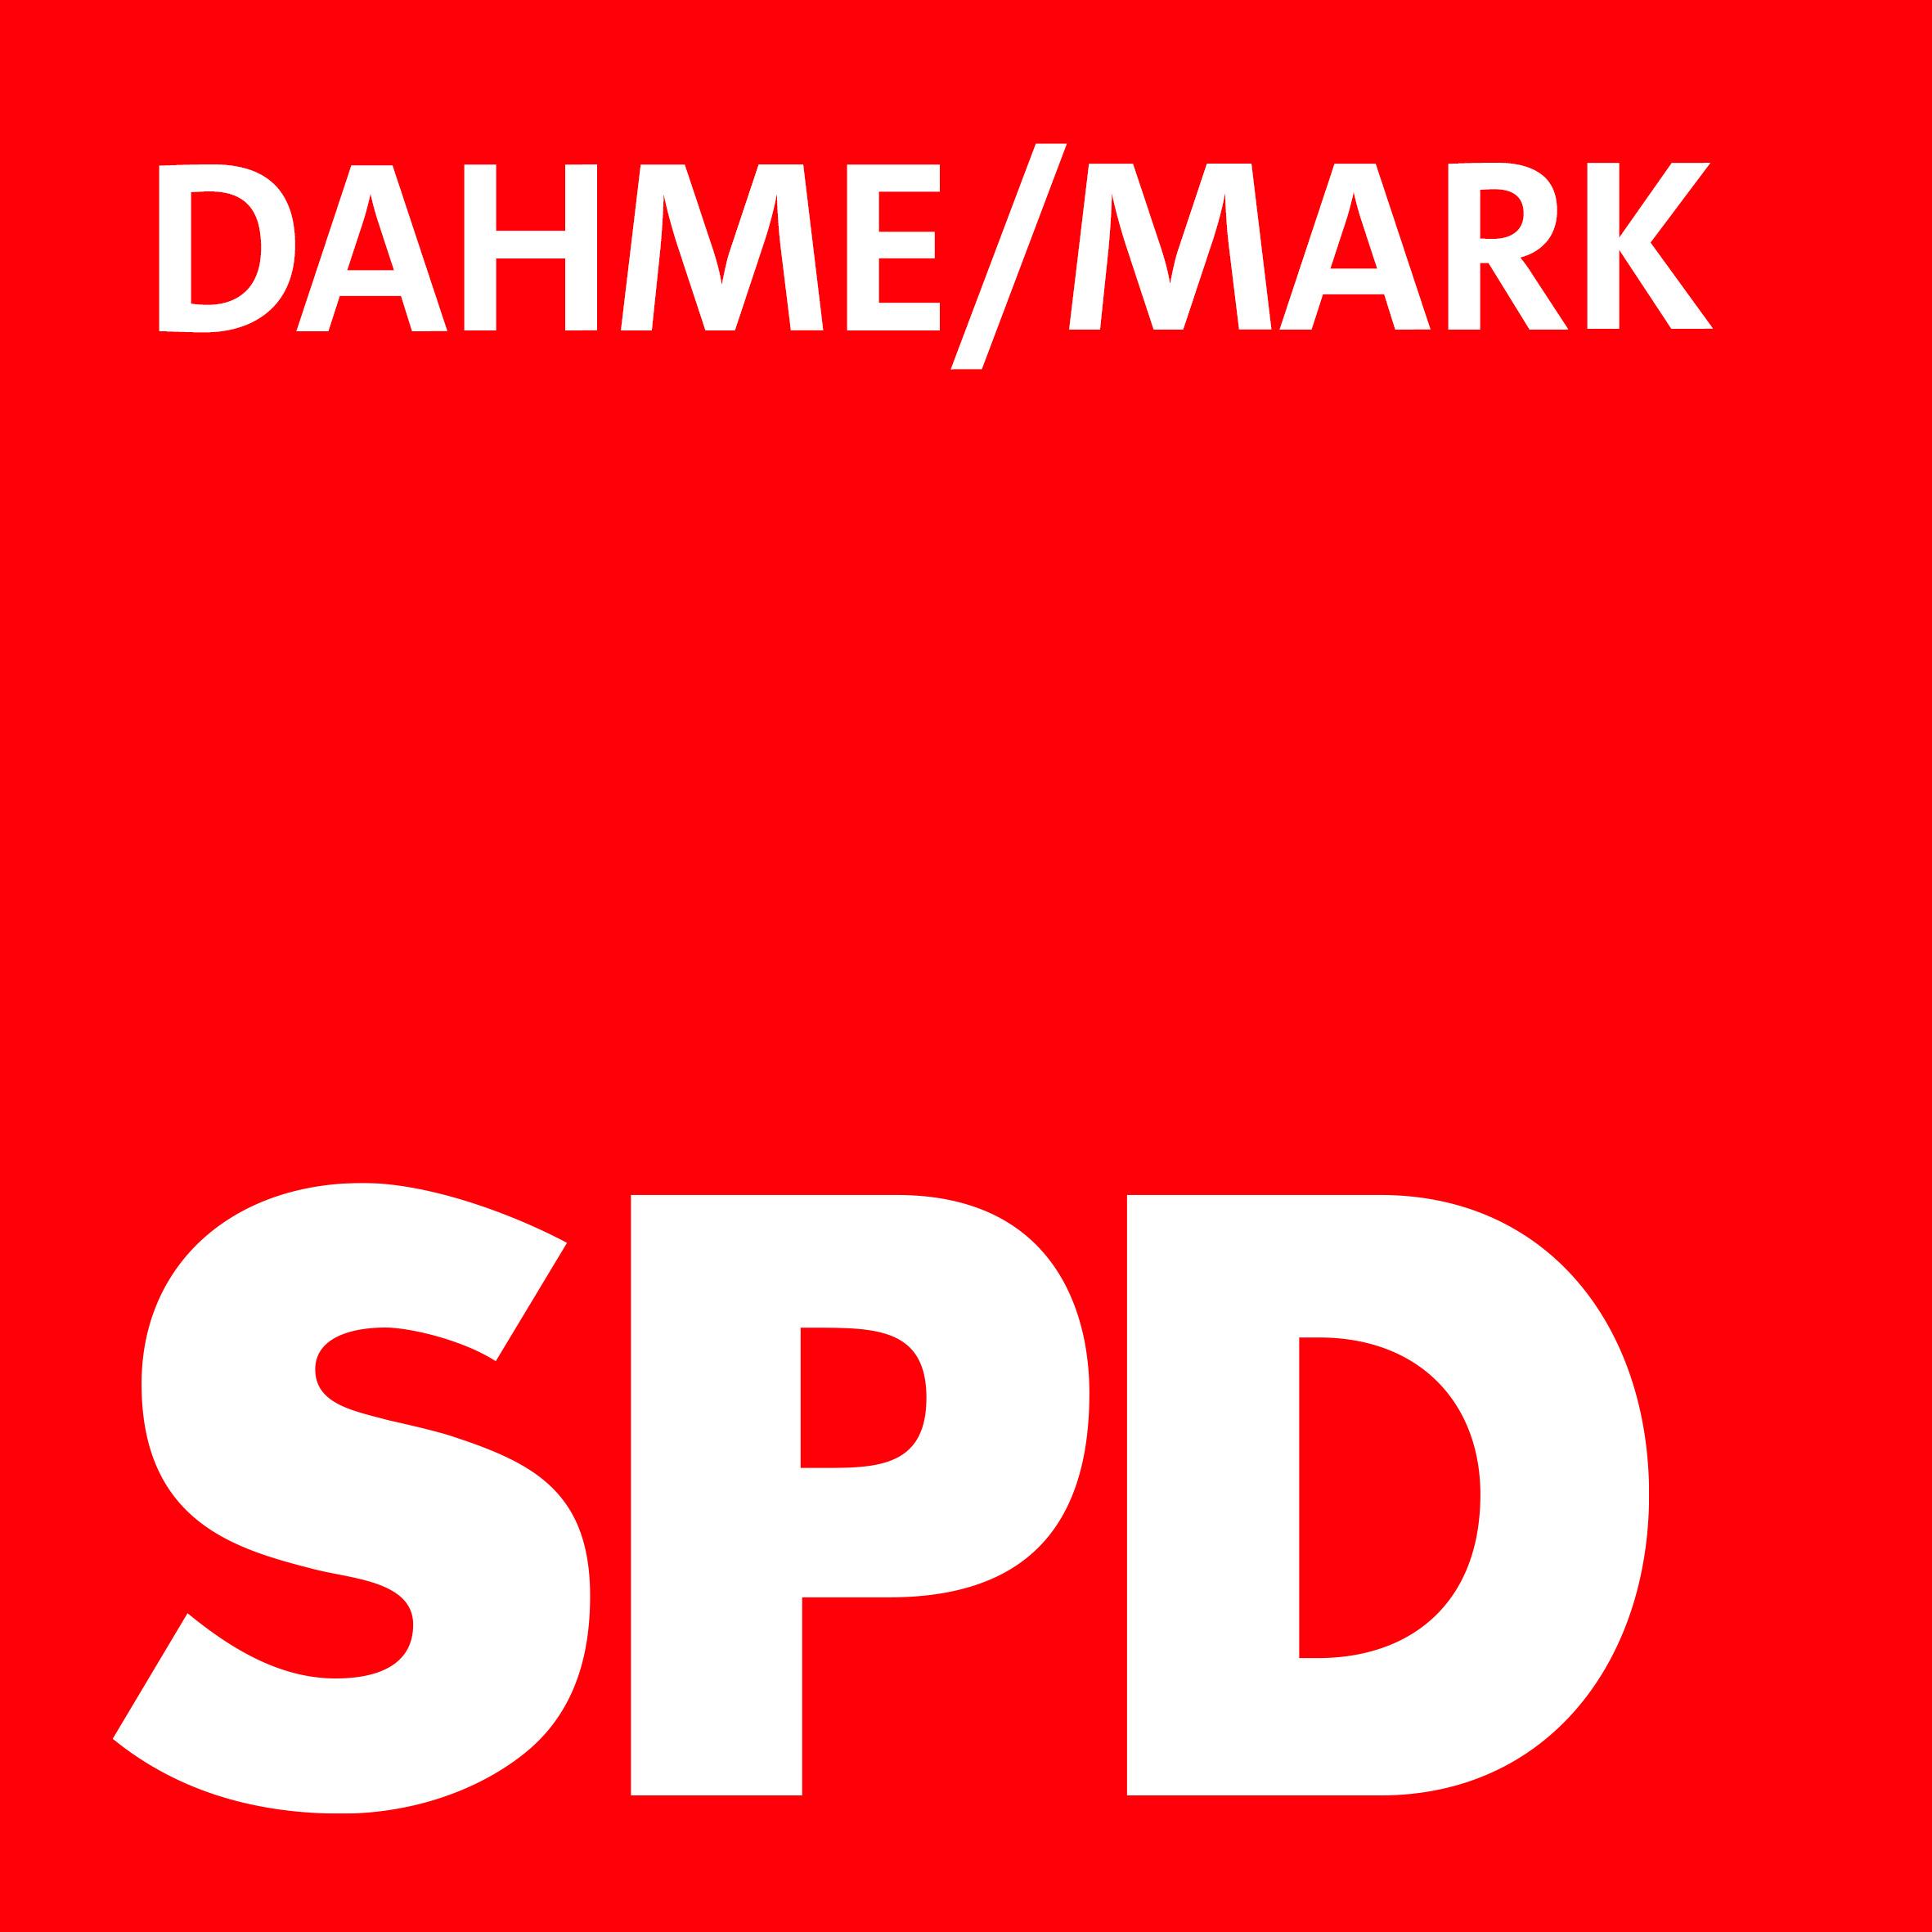 SPD Dahme/Mark